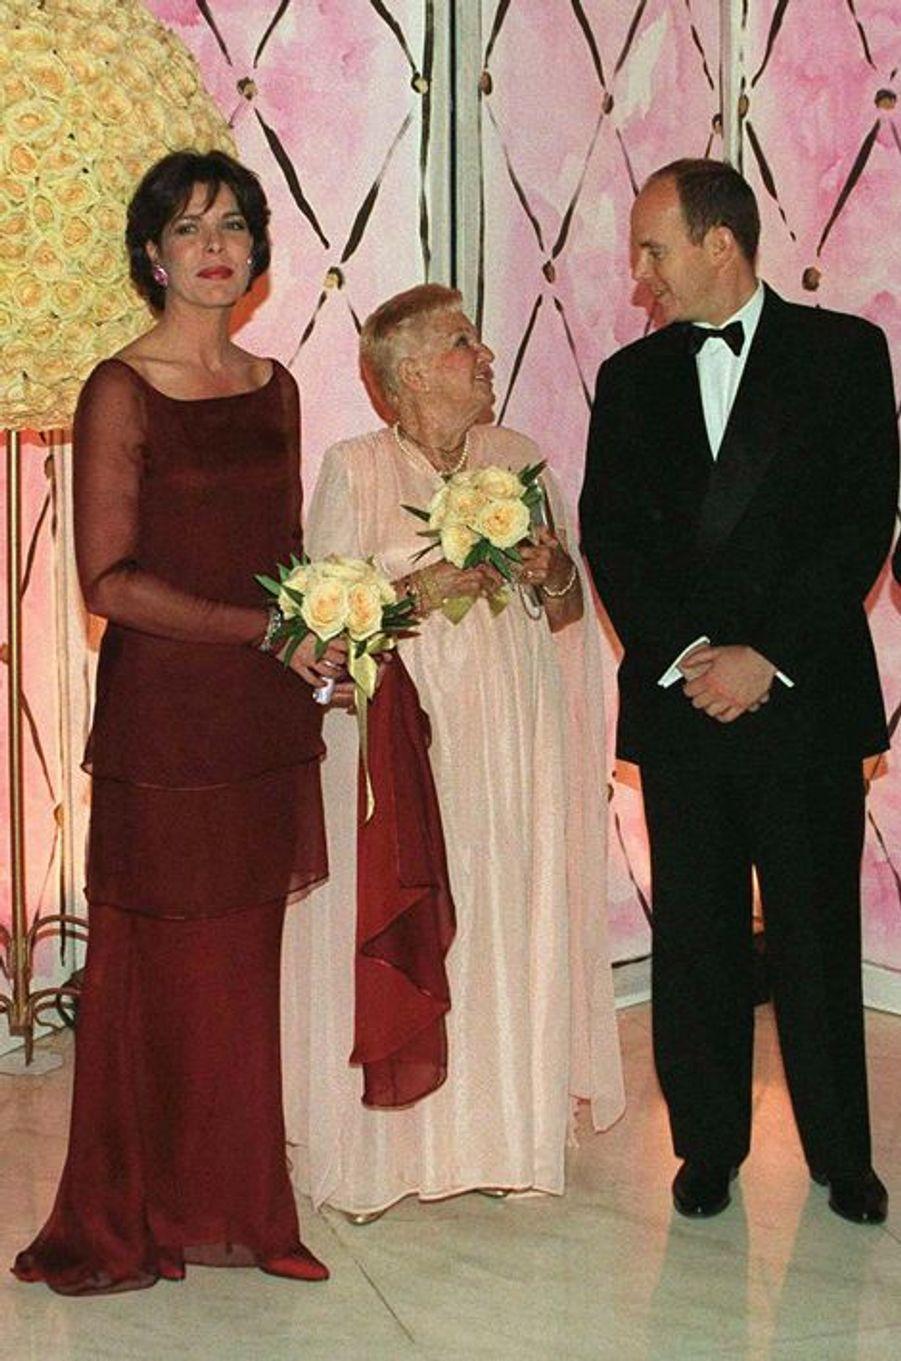 La princesse Caroline de Monaco au bal de la Rose 1998, avec le prince Albert